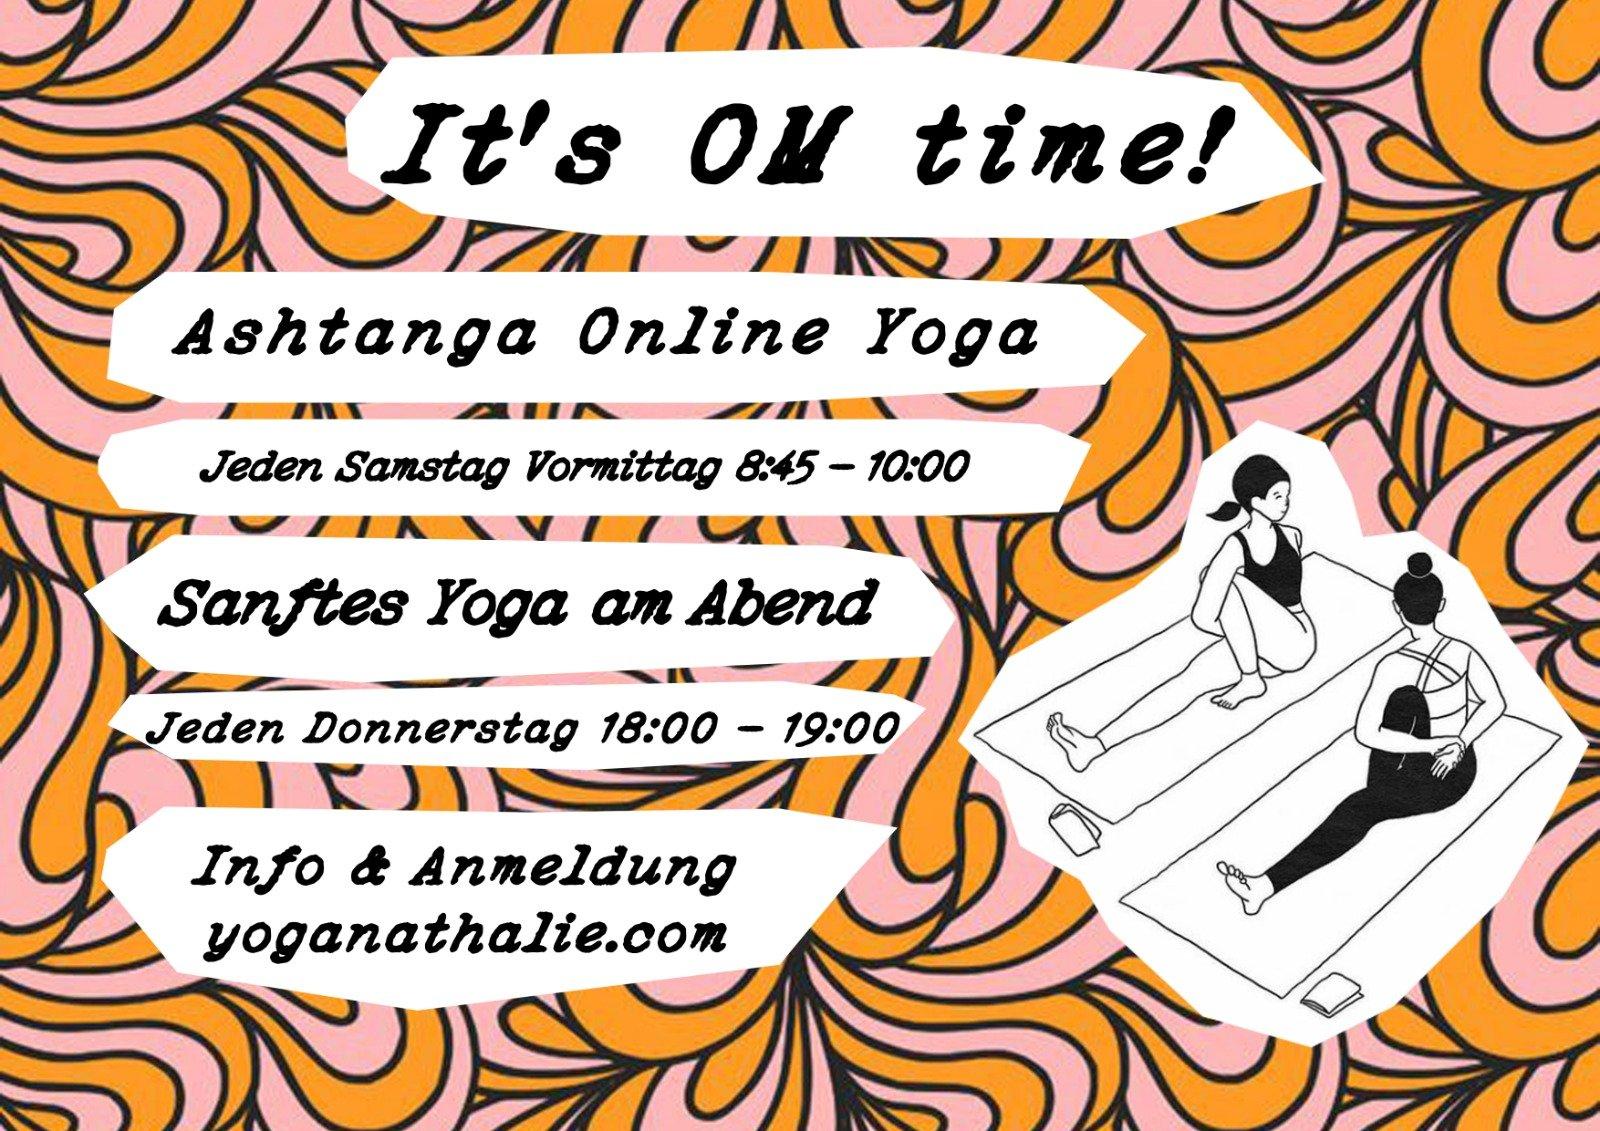 online yoga auf spenden Basis, ashtanga yoga auf spenden Basis, online yoga am Samstag vormittag, online yoga am Donnerstag Abend, yoga für Anfänger online